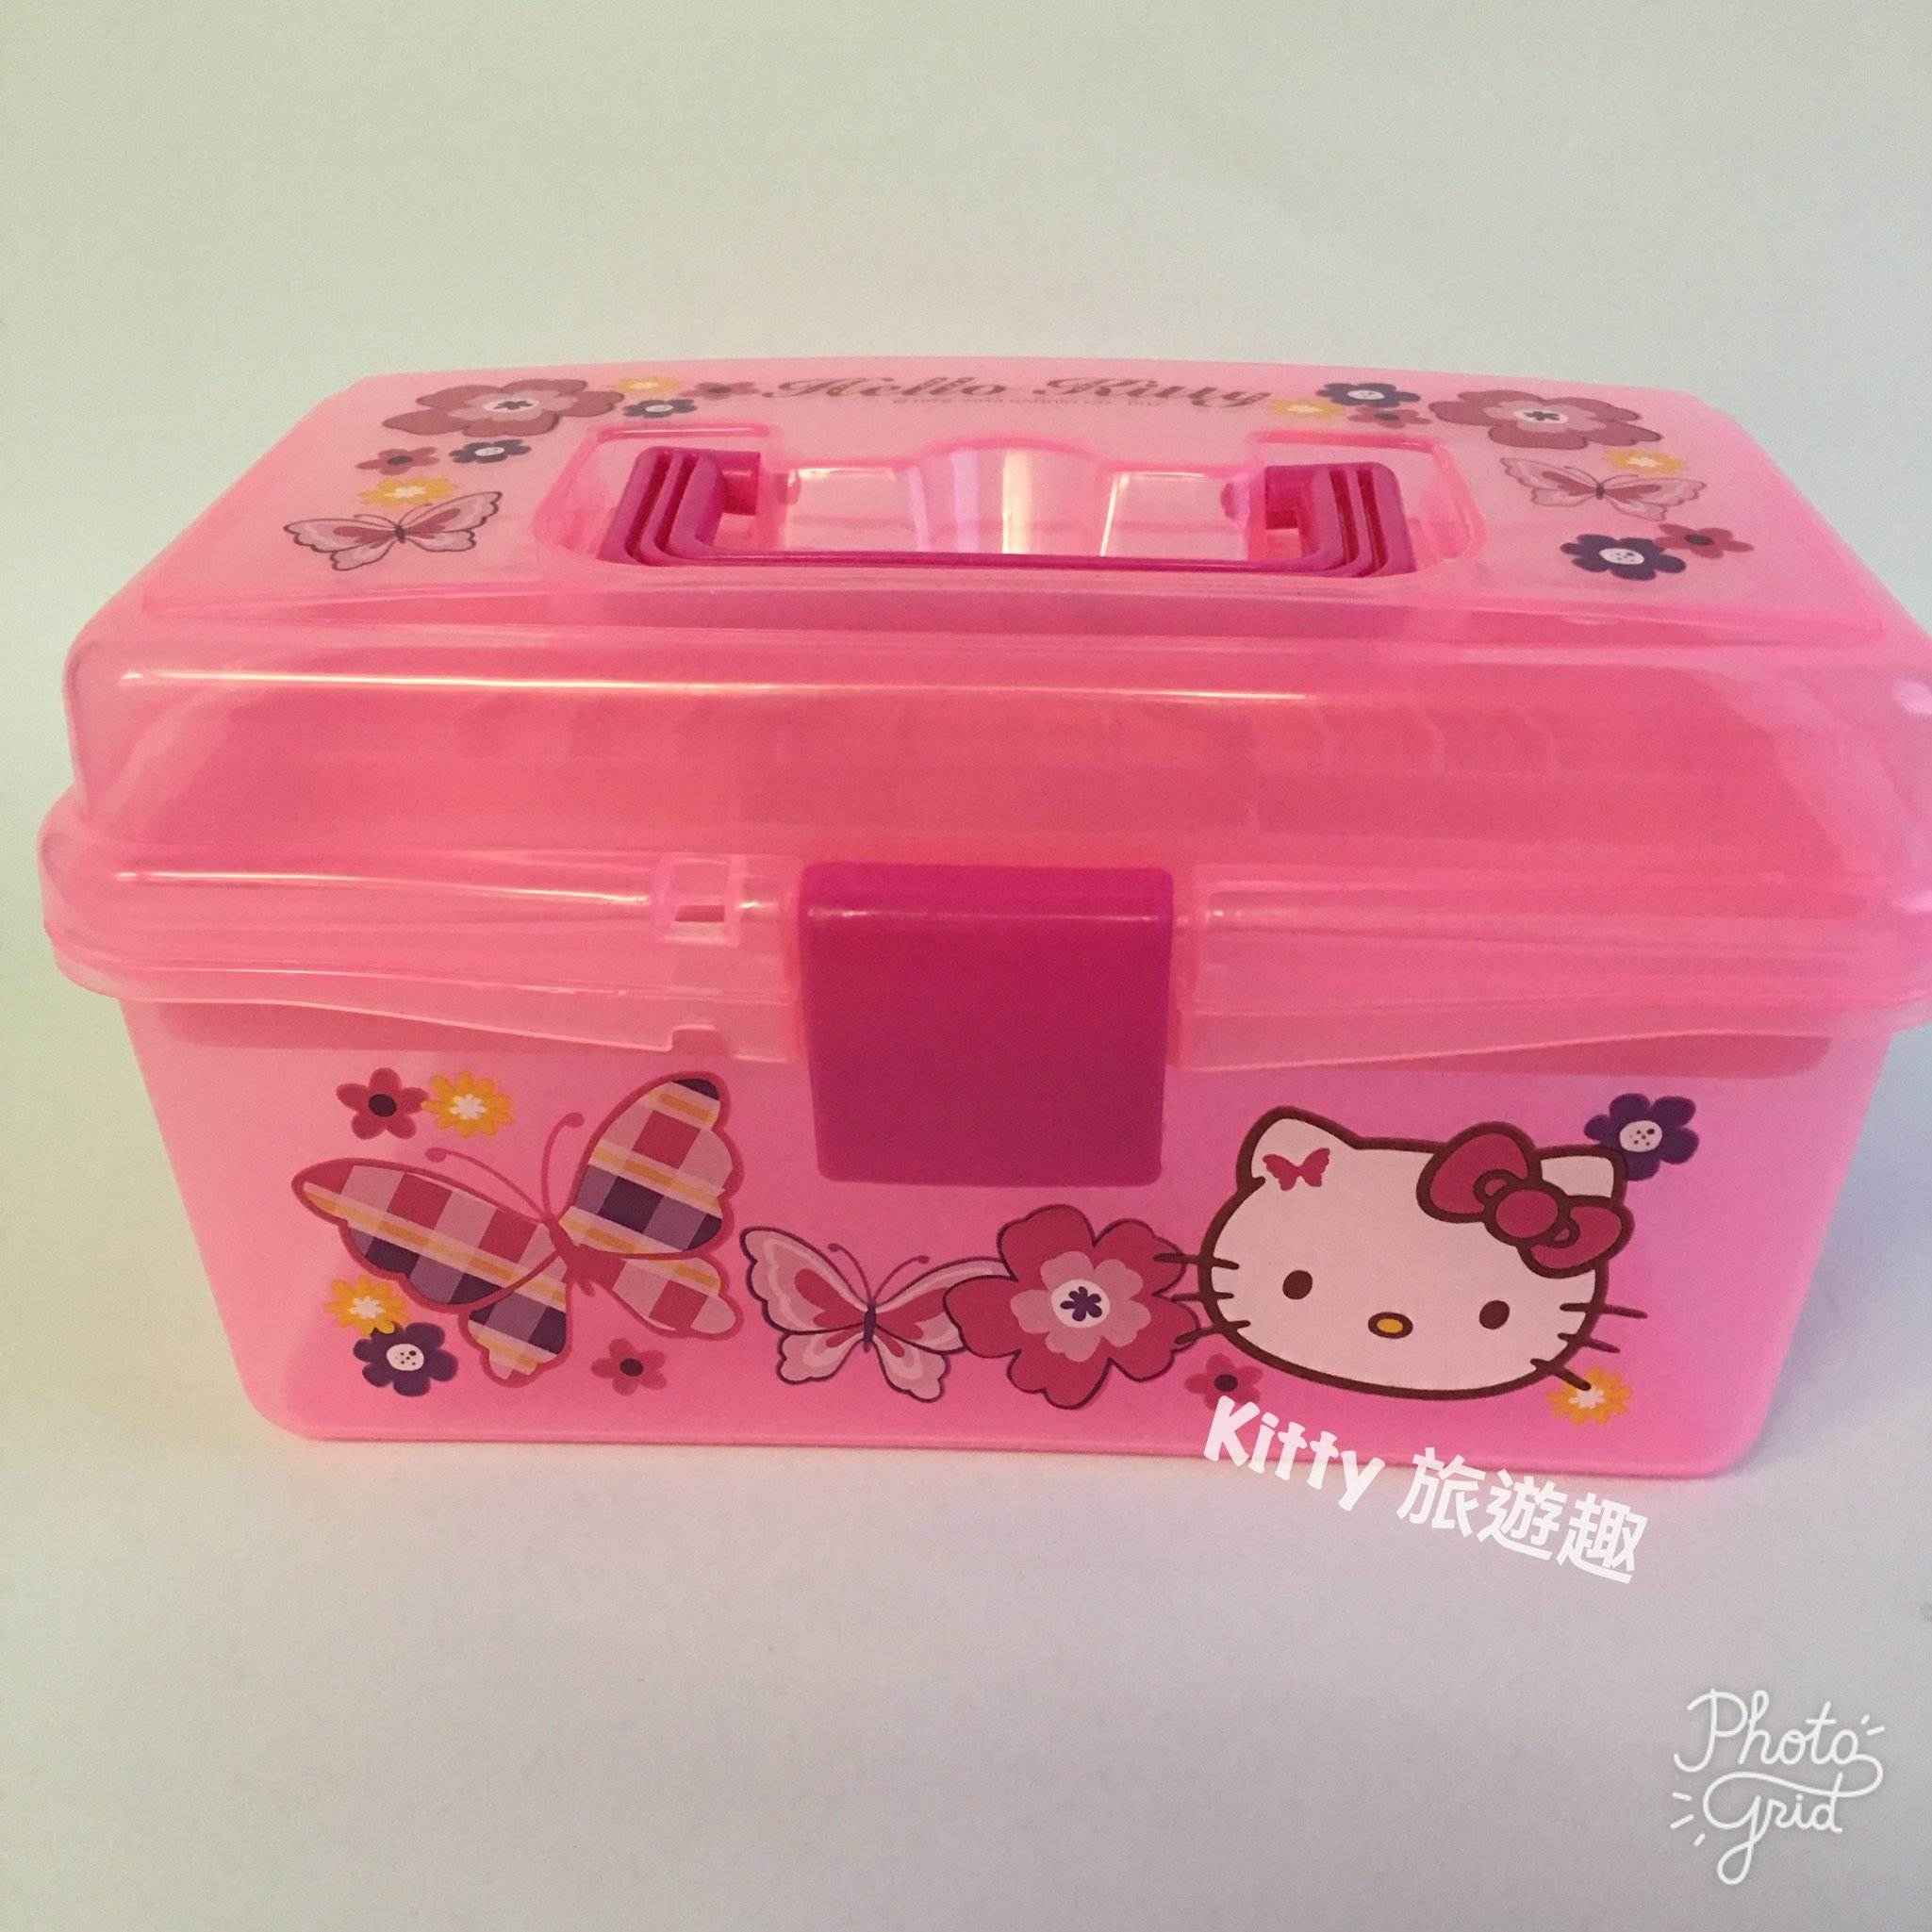 [Kitty 旅遊趣] Hello Kitty 雙層收納提盒 文具盒 小物收納盒 勞作盒 凱蒂貓 粉紅色 透明收納盒